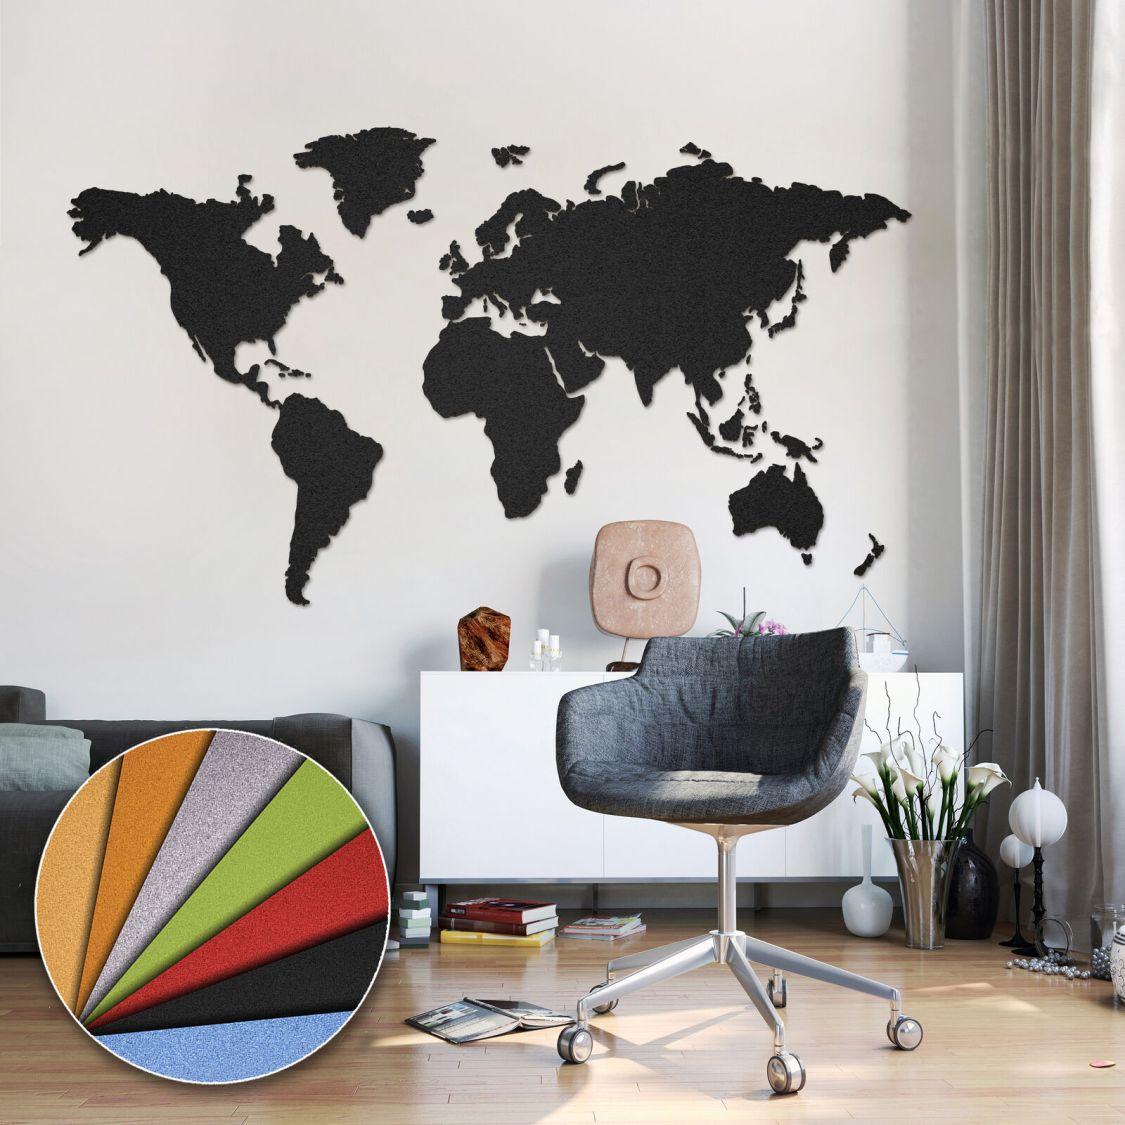 Weltkarte Kork Pinnwand Korktafel Memoboard Bilder Selbstklebend! 8 Farben!